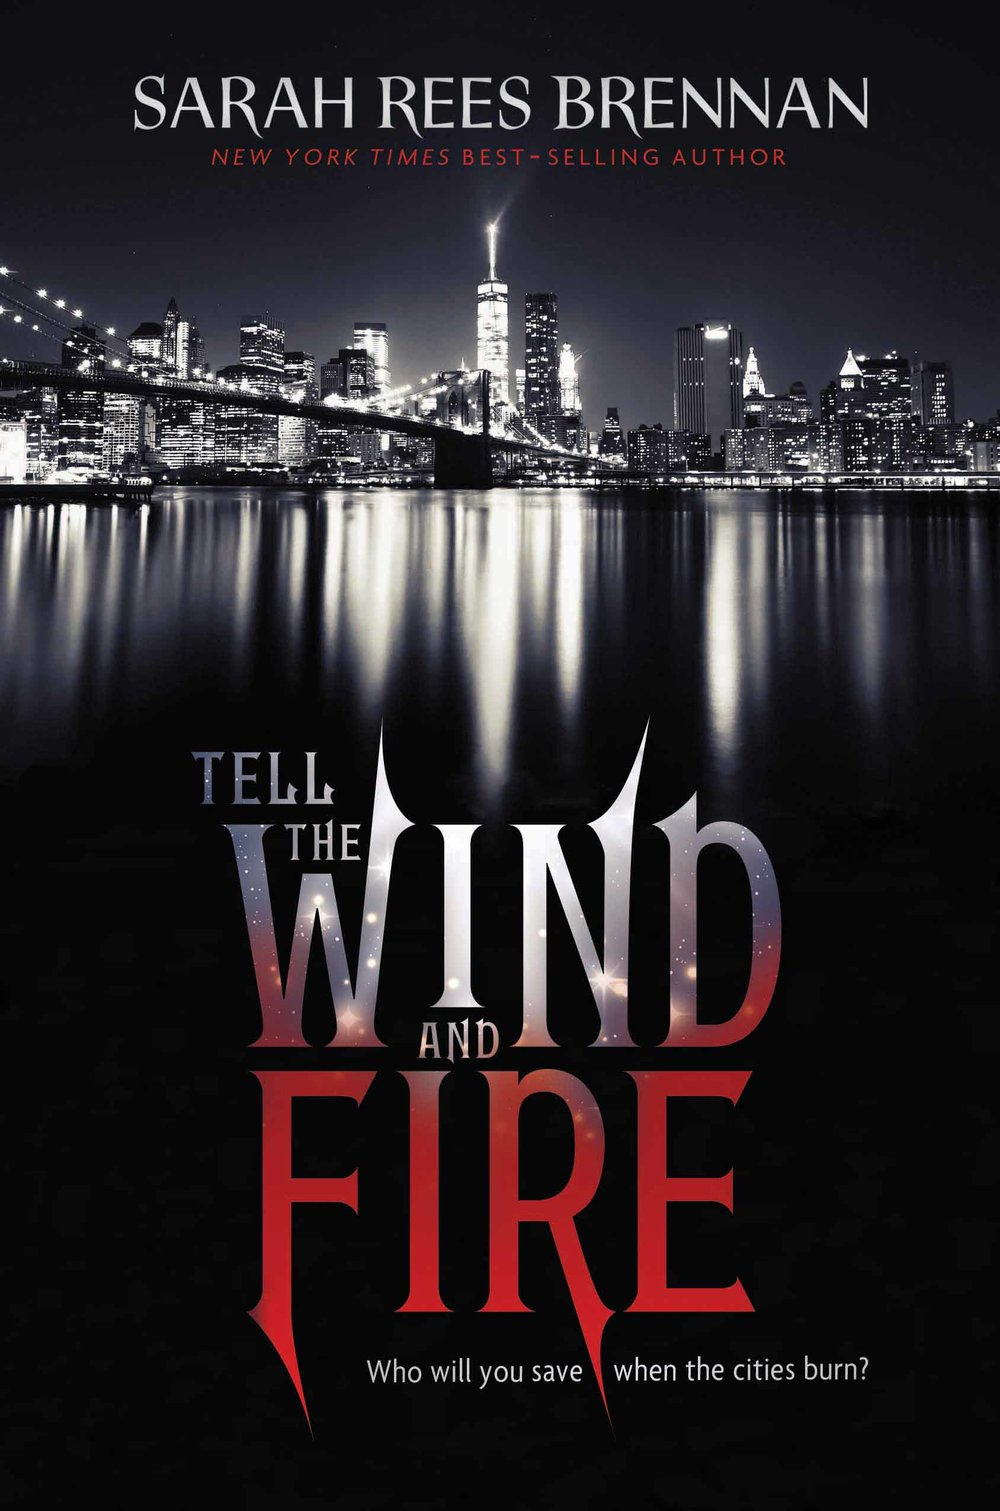 sarah-brennan-tellthewindandfire-1.jpg